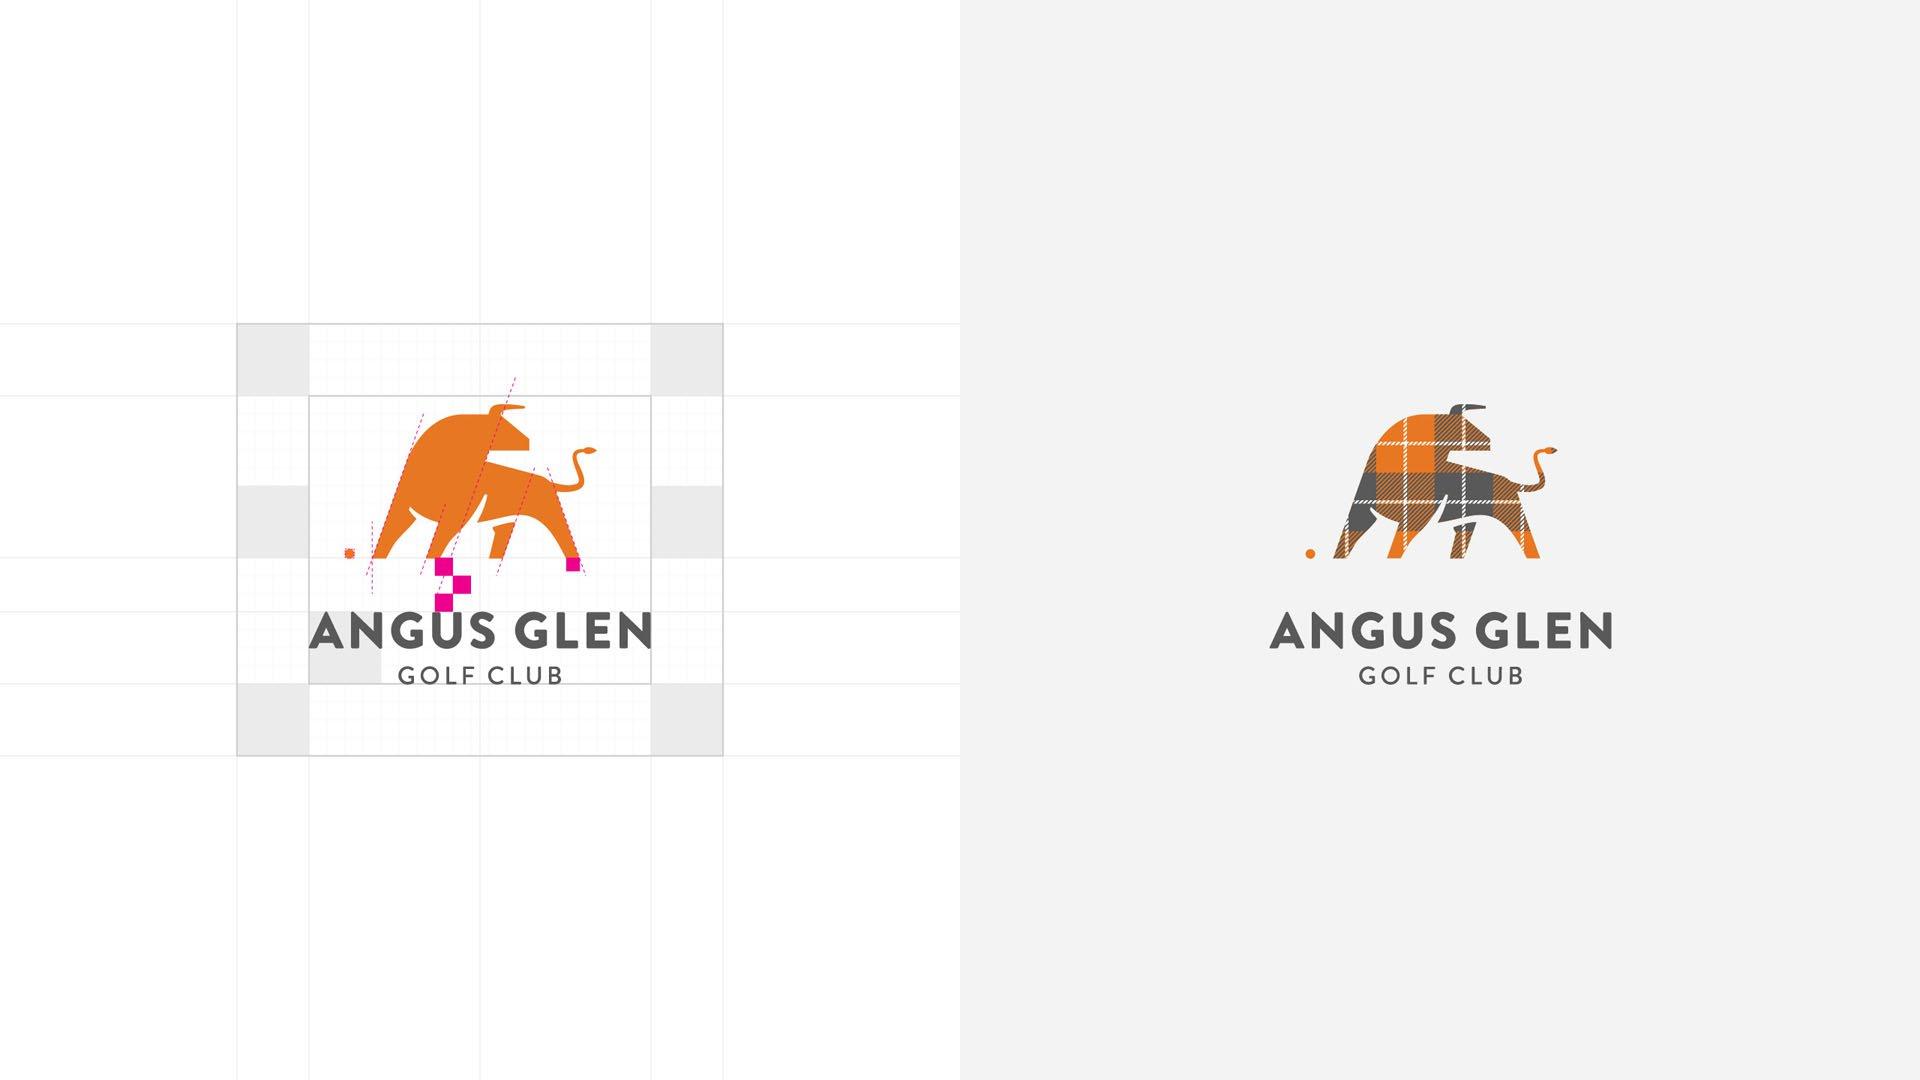 angus glen golf club overdrive design ltd